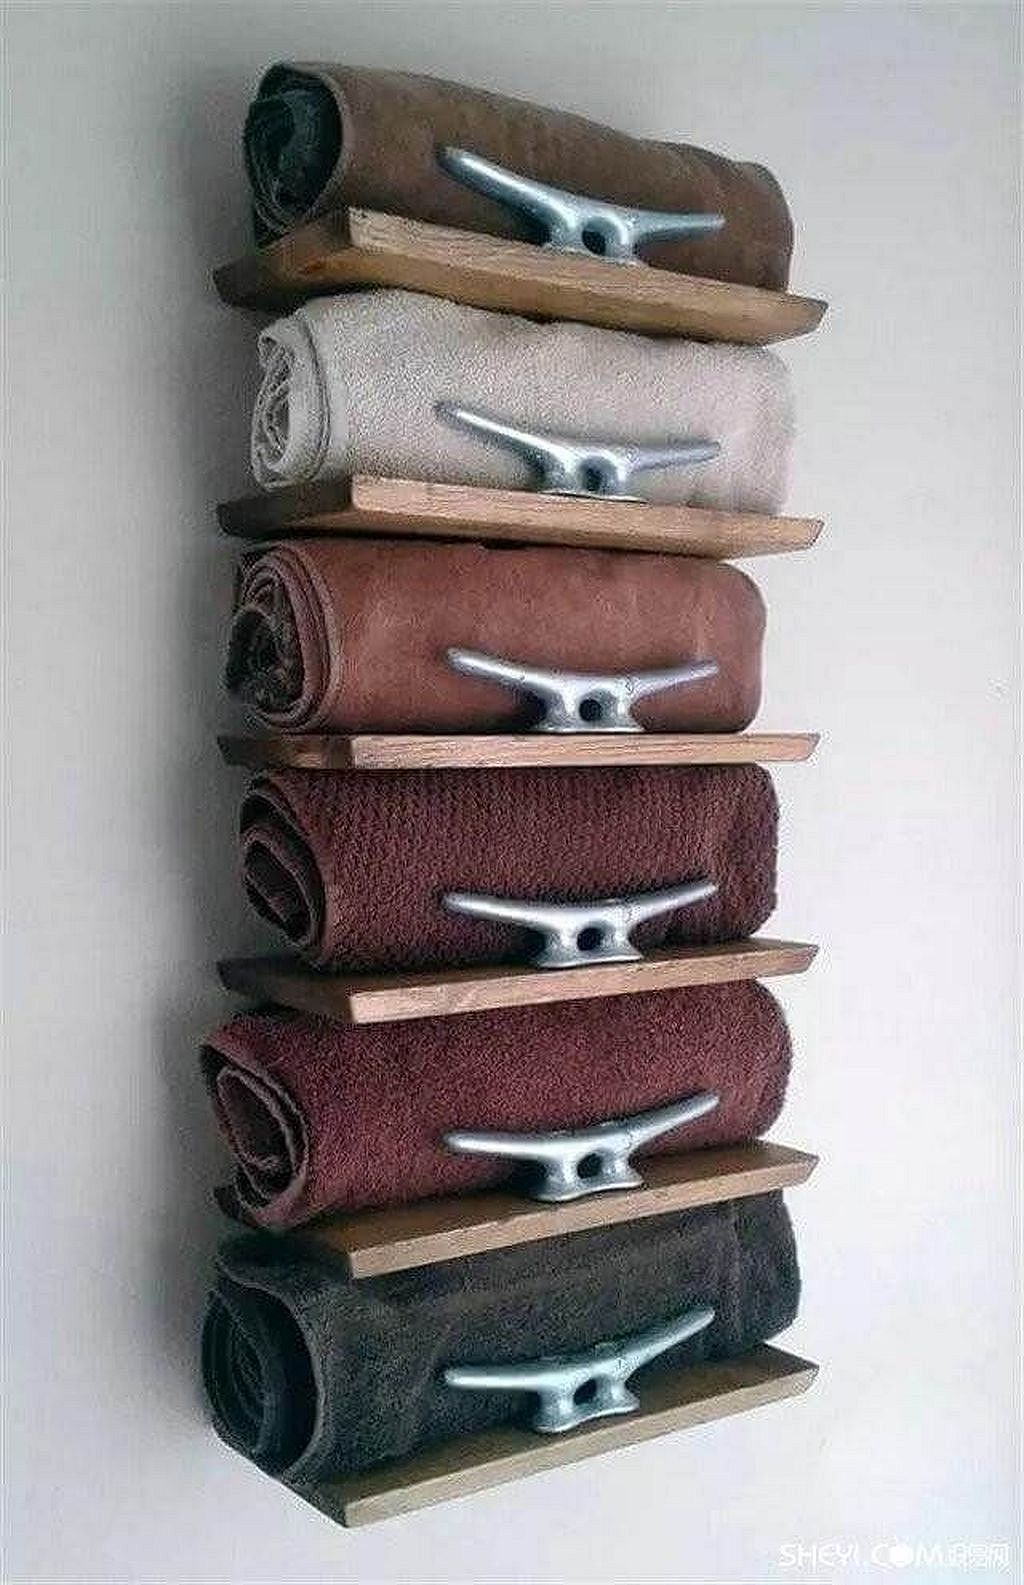 40 Towel Storage For Small Bathroom Ideas 28 Diy Towels Nautical Towel Nautical Bathrooms